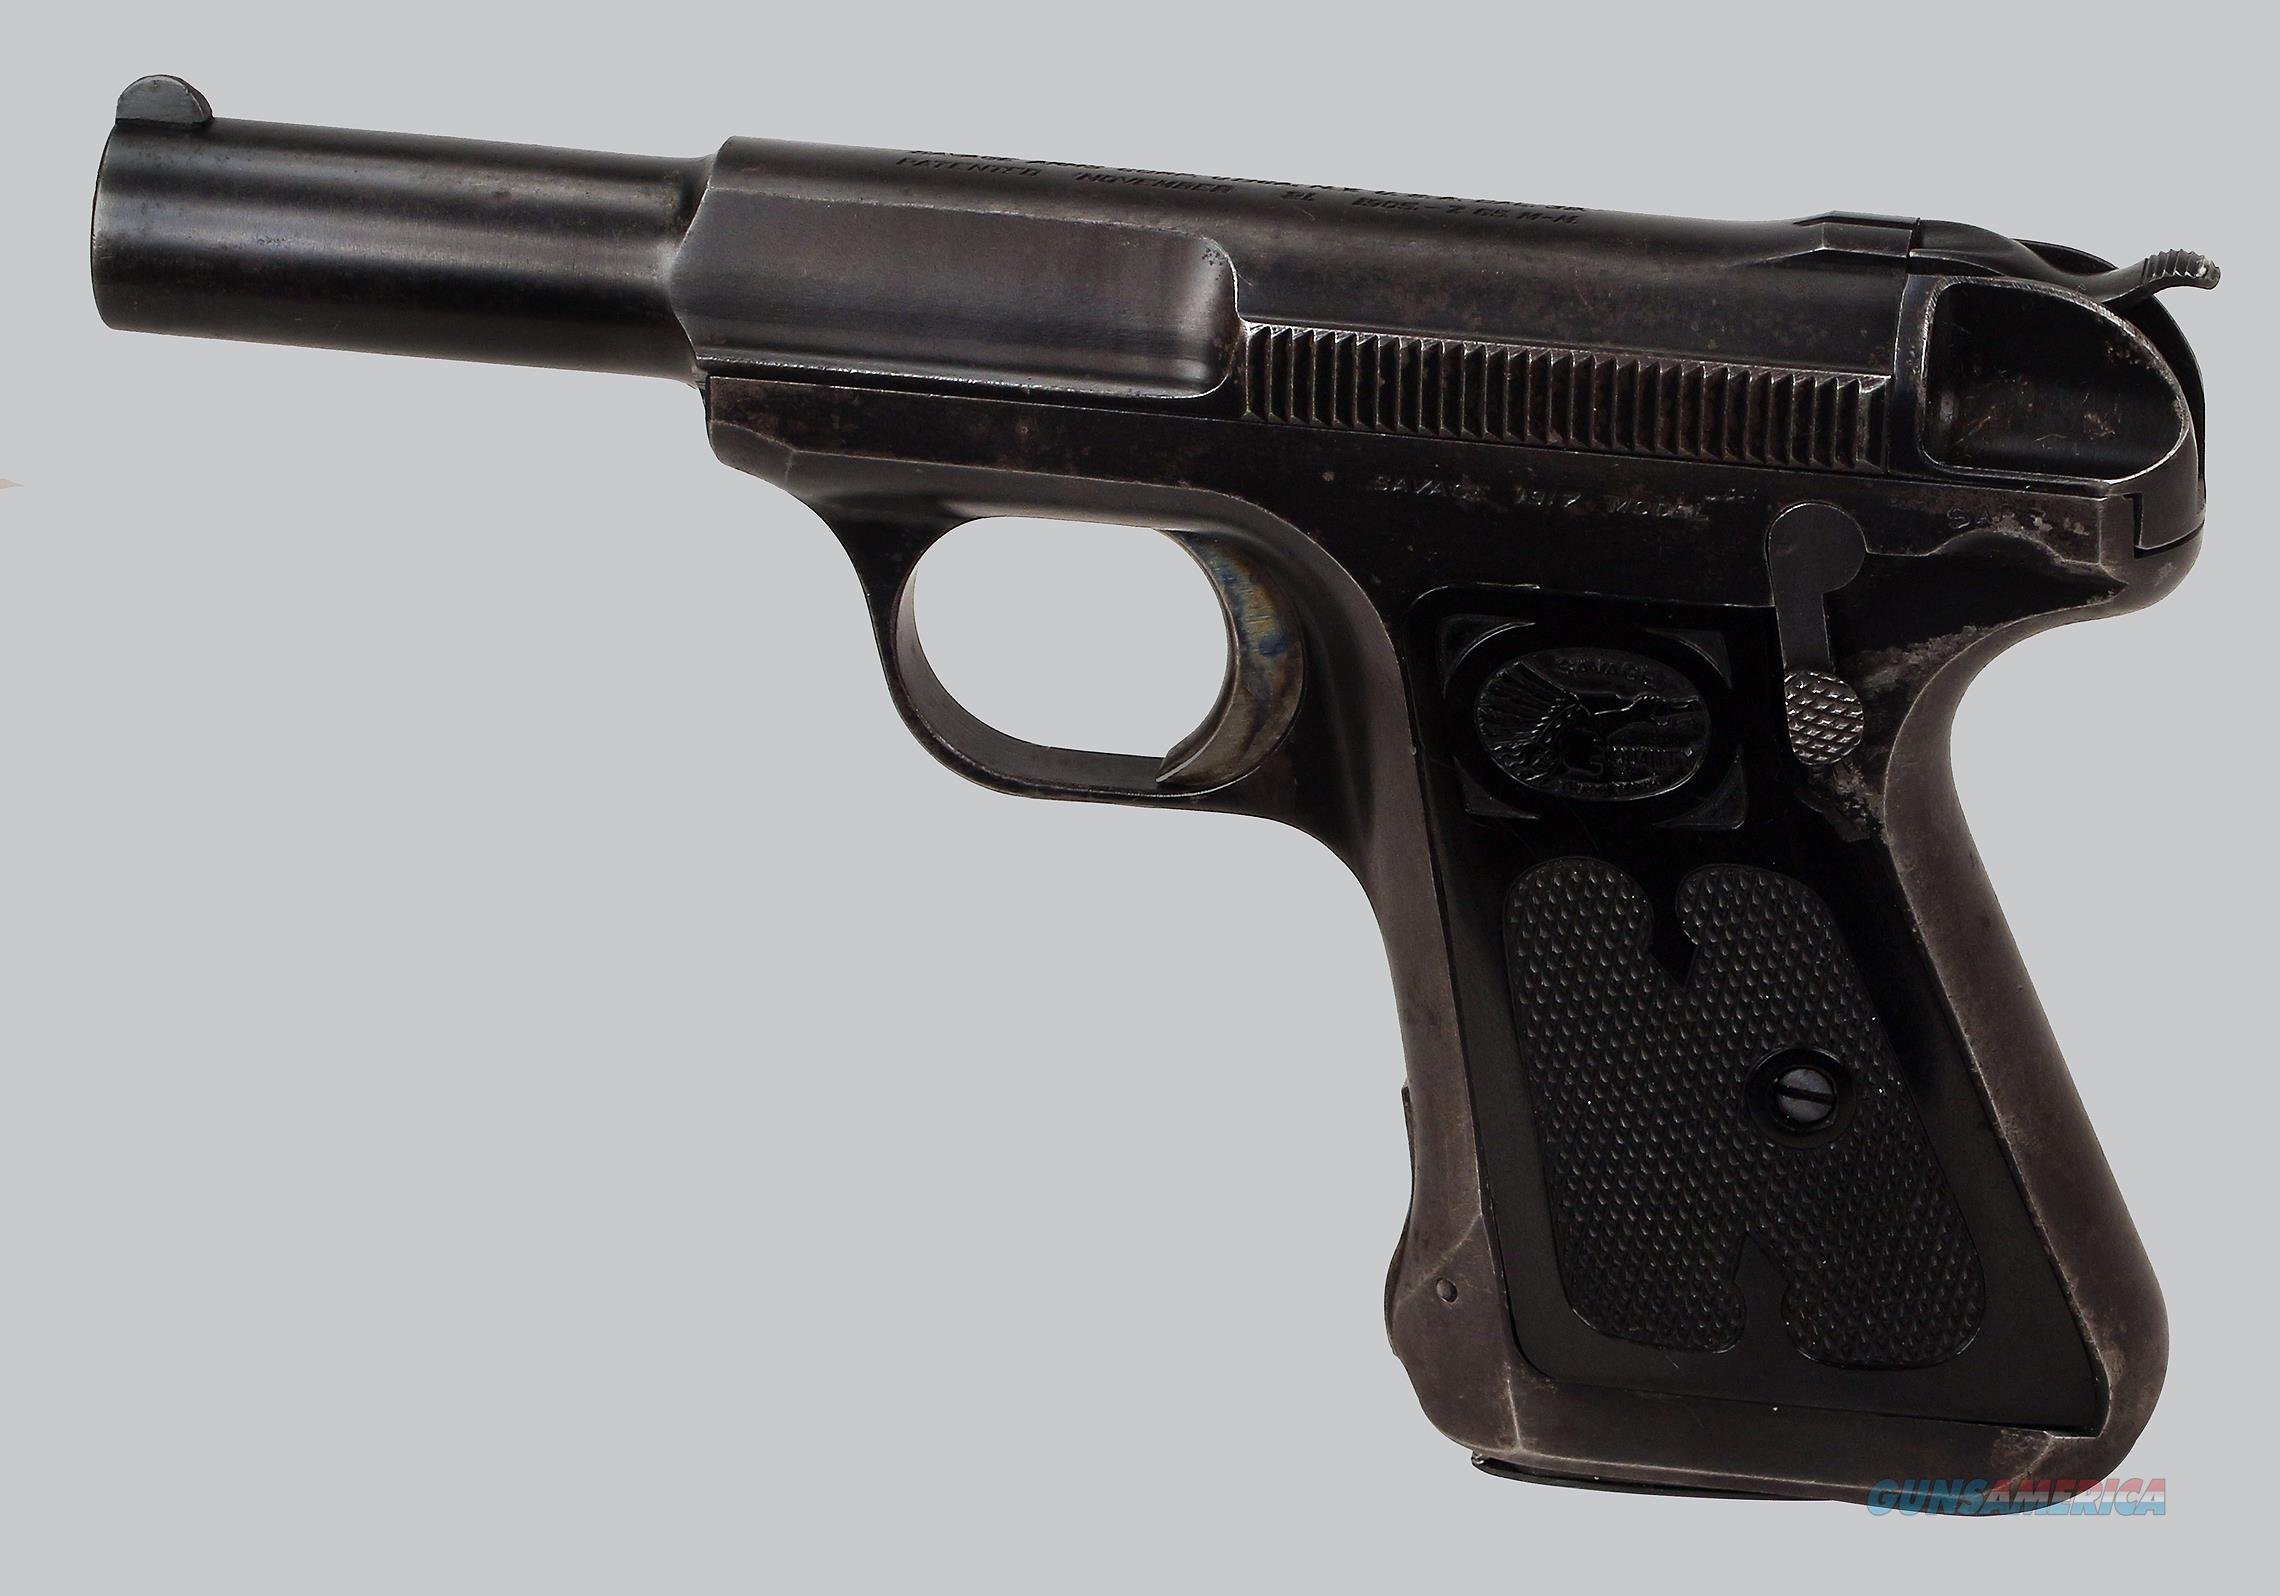 Savage 1917 32acp Pistol  Guns > Pistols > Savage Pistols